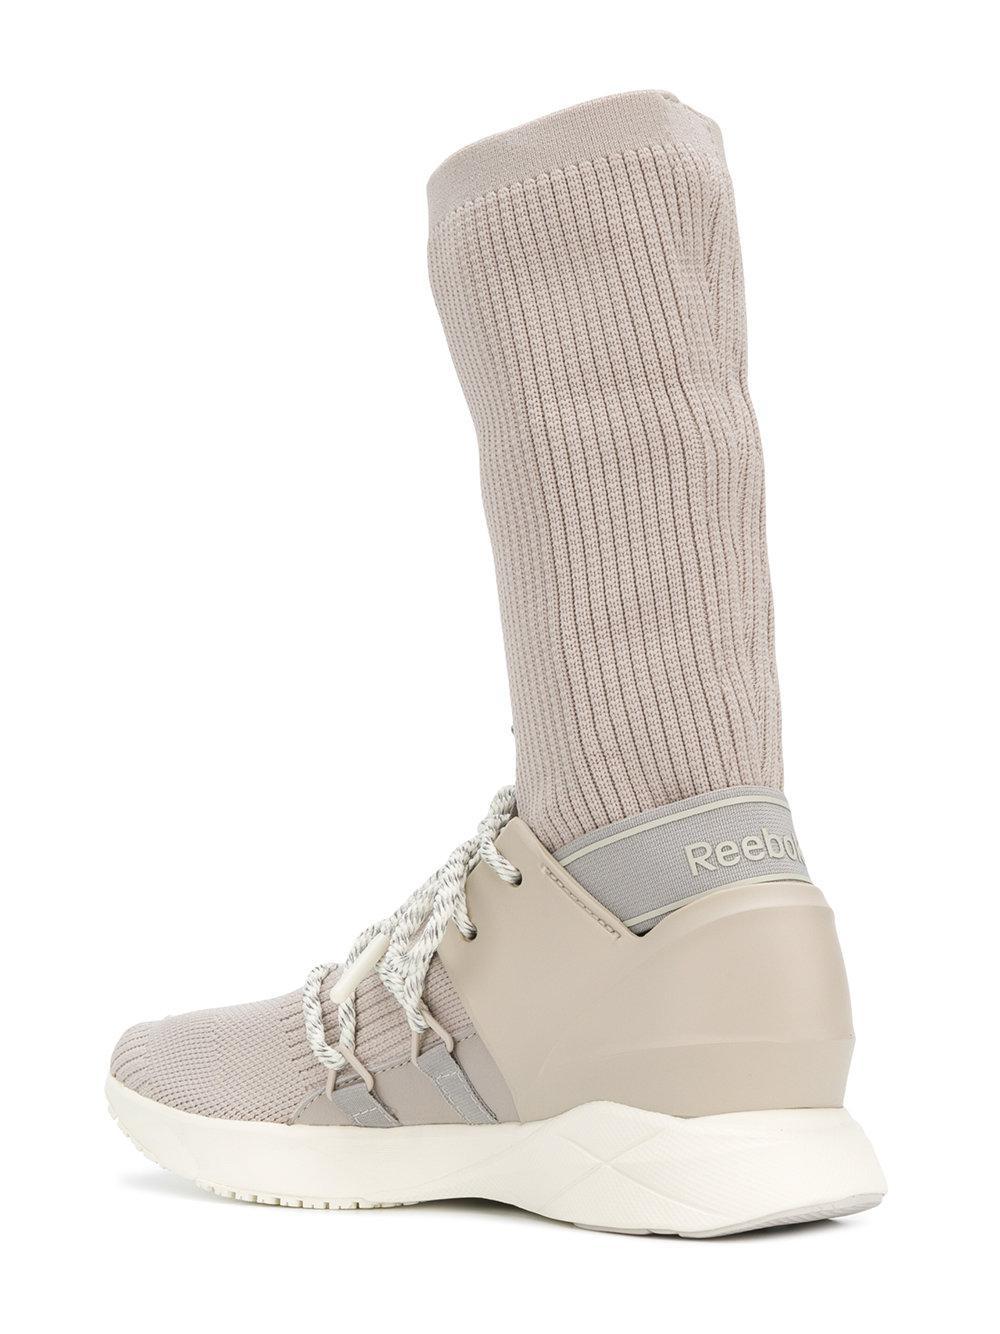 Sock Supreme Premium sneakers - Nude & Neutrals Reebok jlthRElqKX